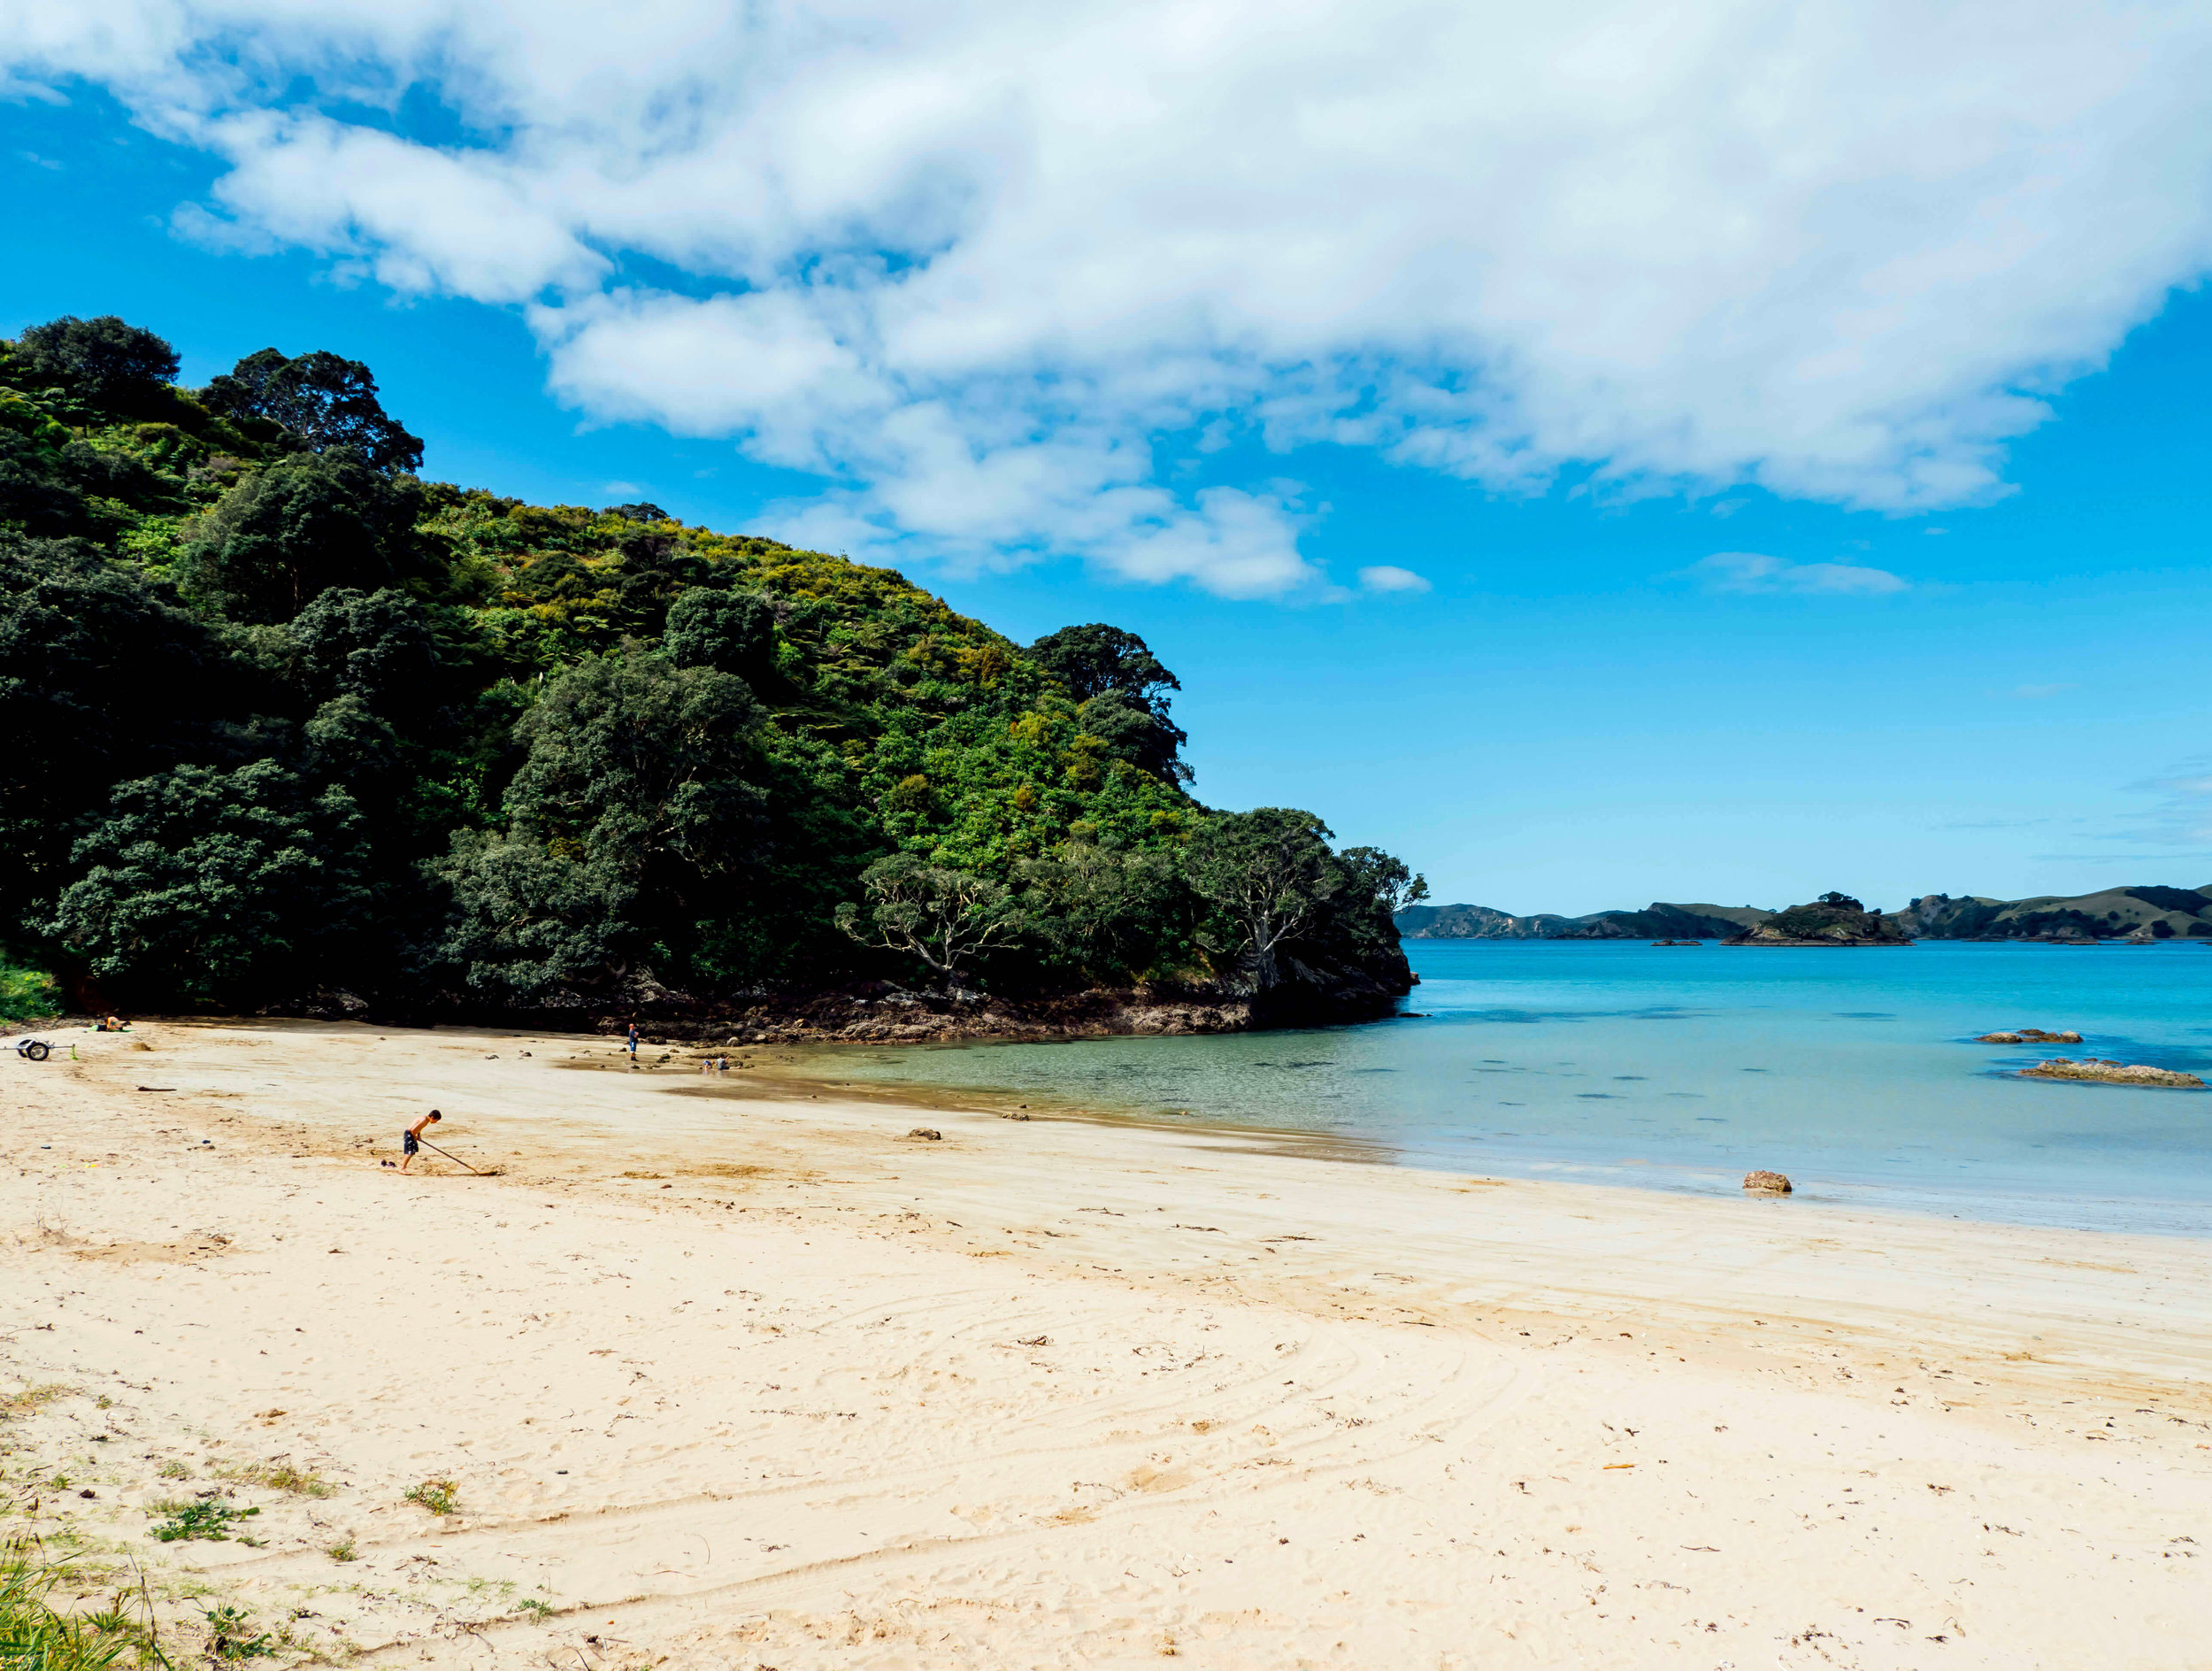 Te_Koha_Lodge_Boutique_Hotel_New_Zealand.jpg